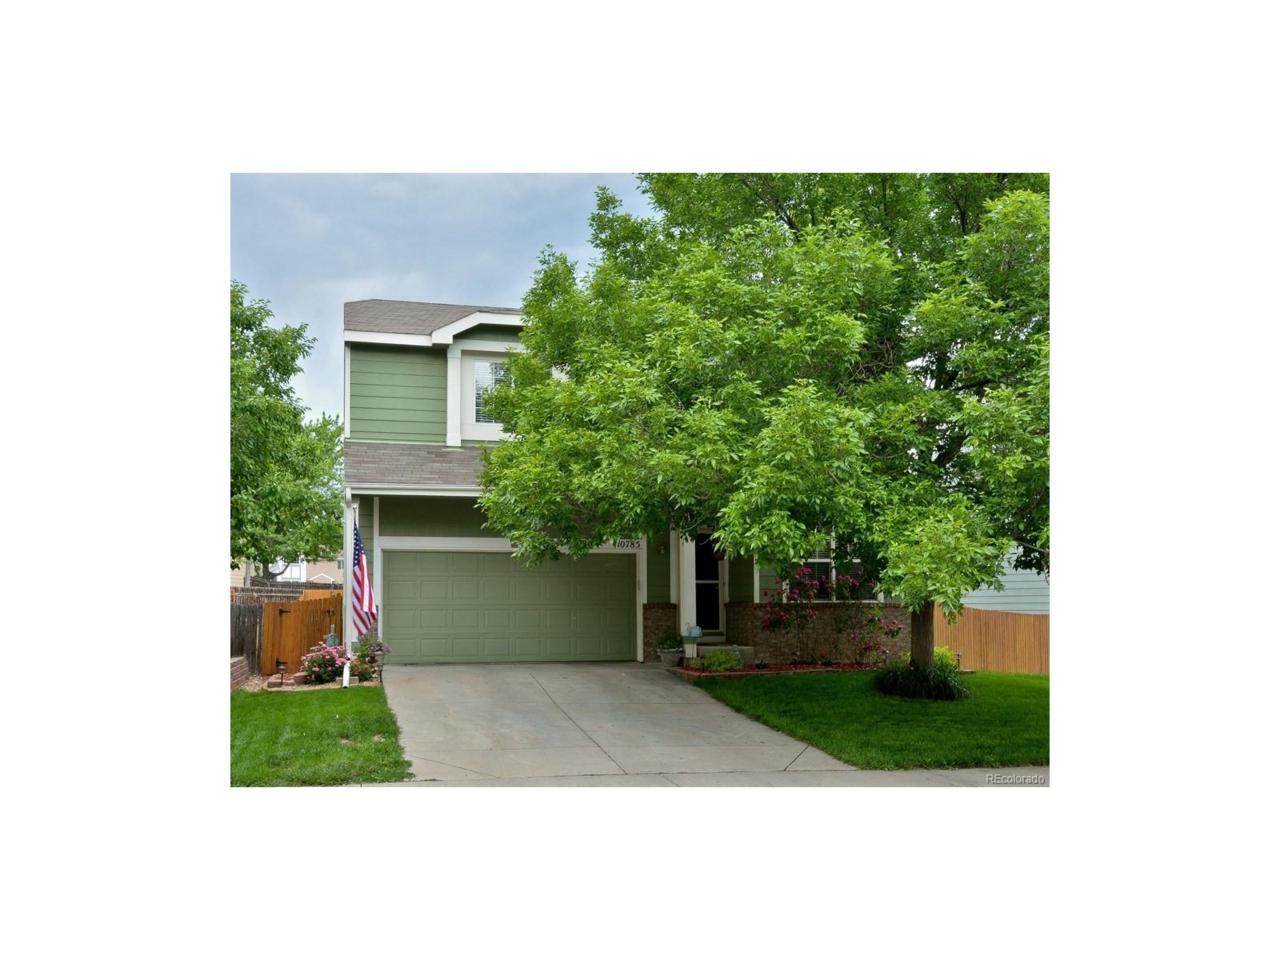 10785 Madison Way, Northglenn, CO 80233 (MLS #7321730) :: 8z Real Estate